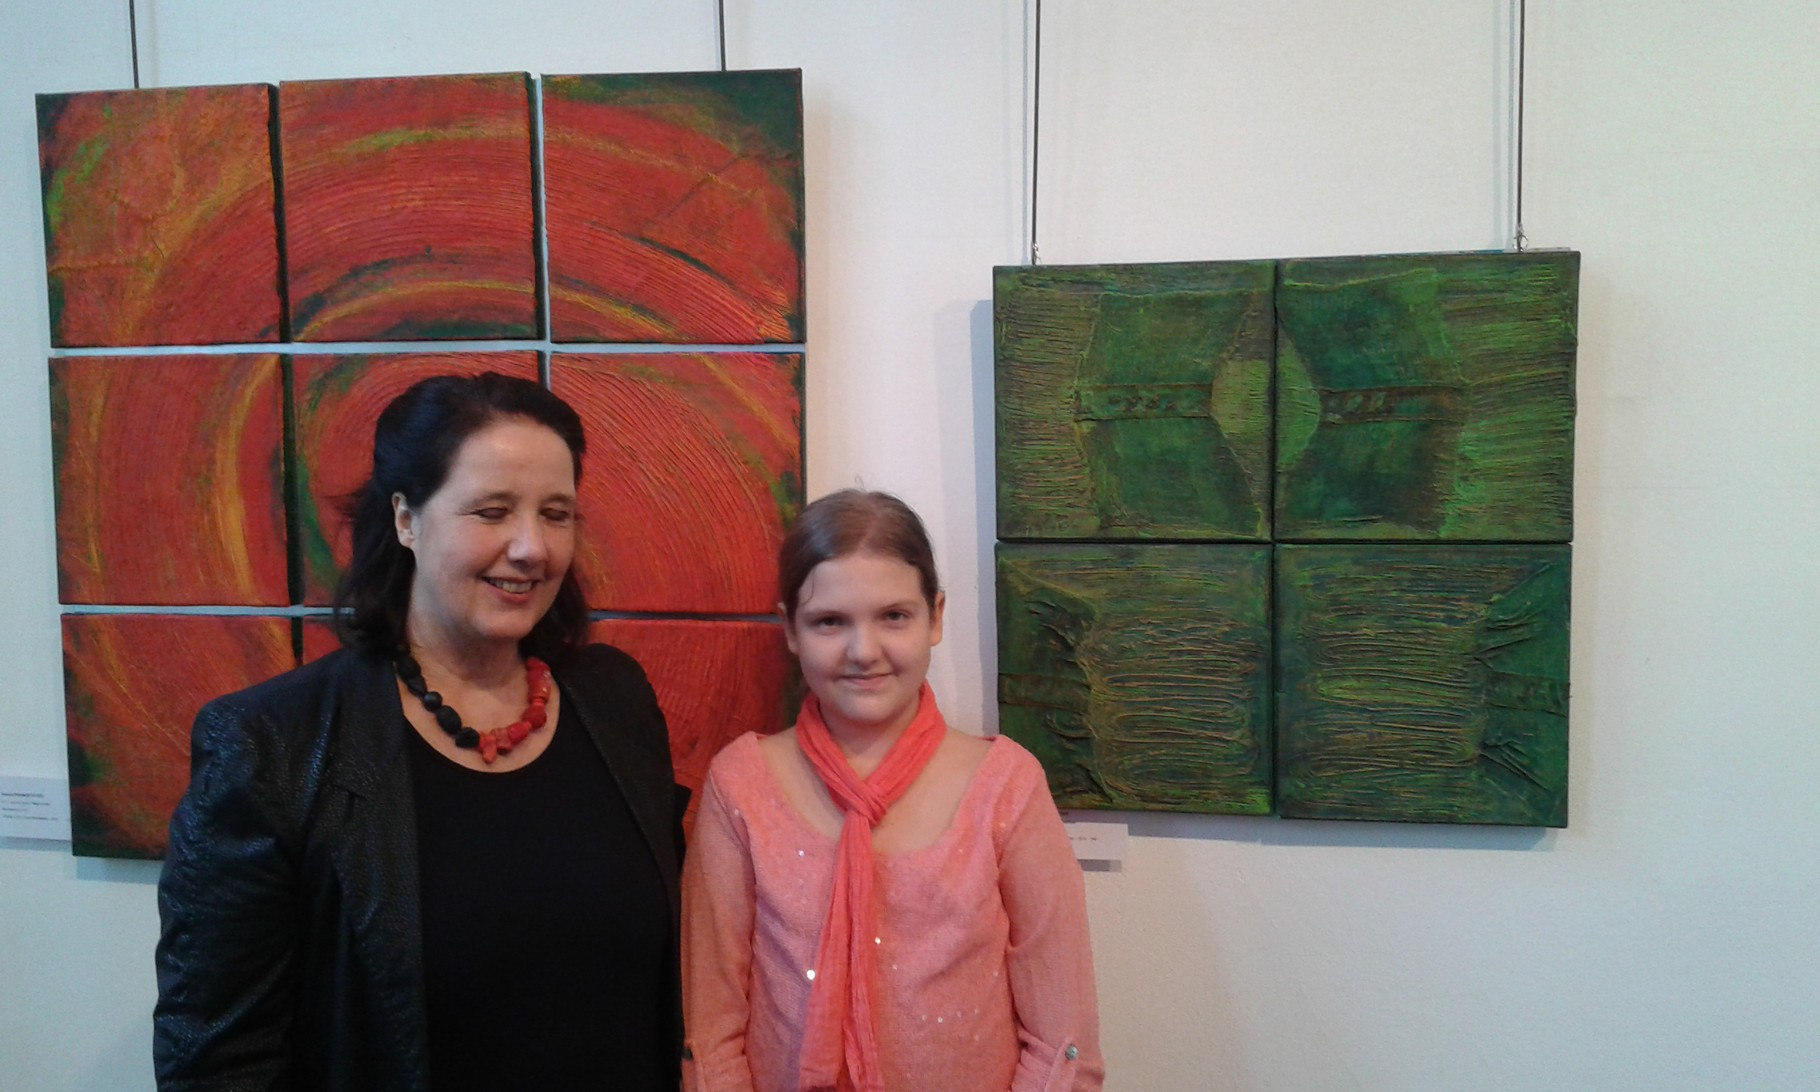 Verena Prandstätter - Künstlerin - 14.4.2015